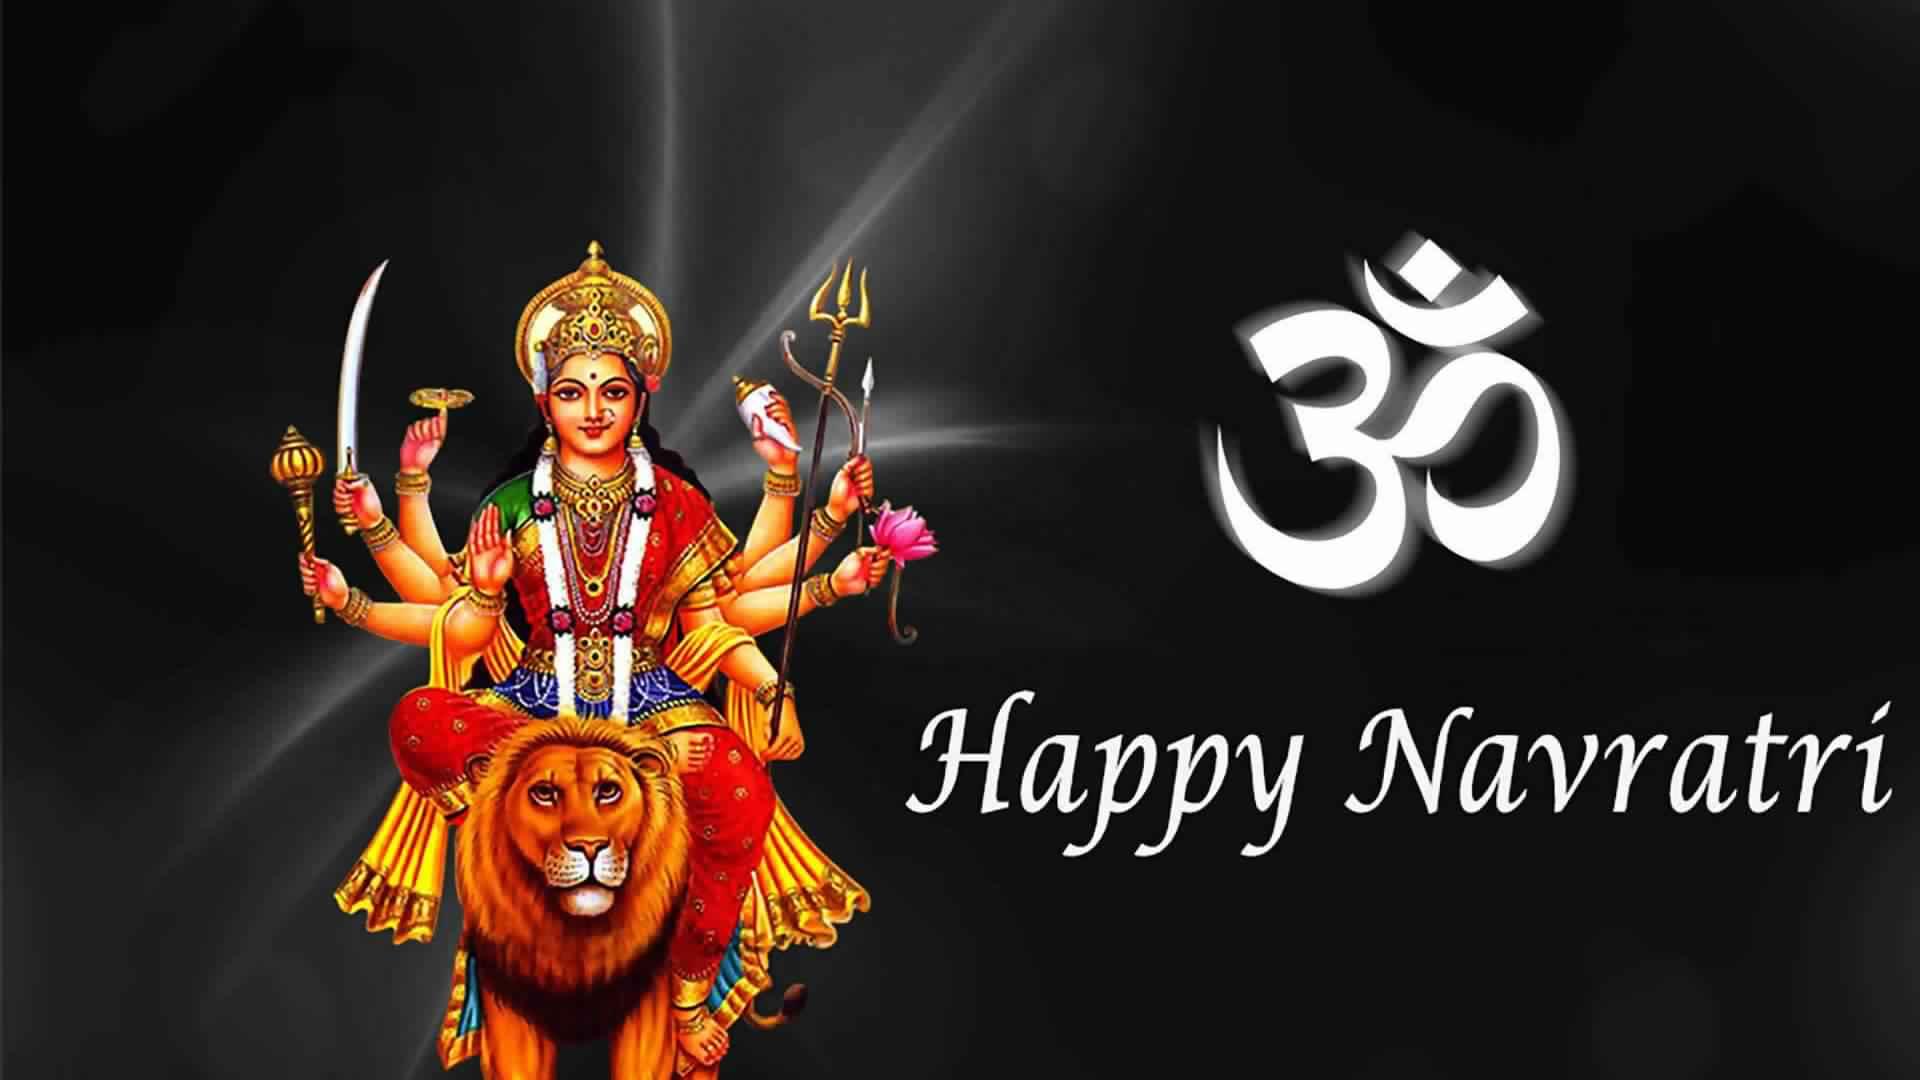 Navratri Dp For Whatsapp